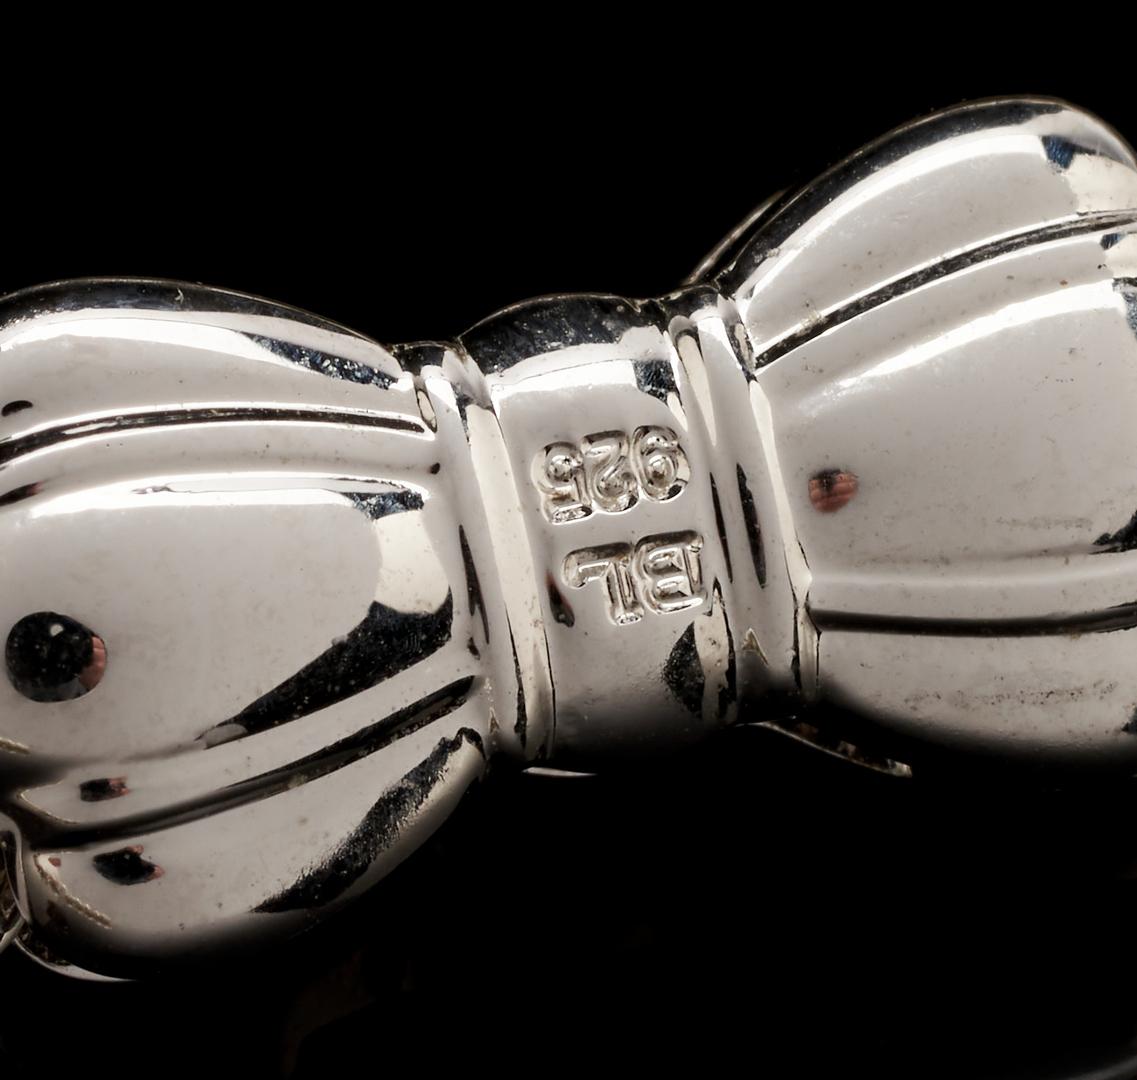 Lot 269: 2 Blue Lagoon Pearl Bracelets by Mikimoto